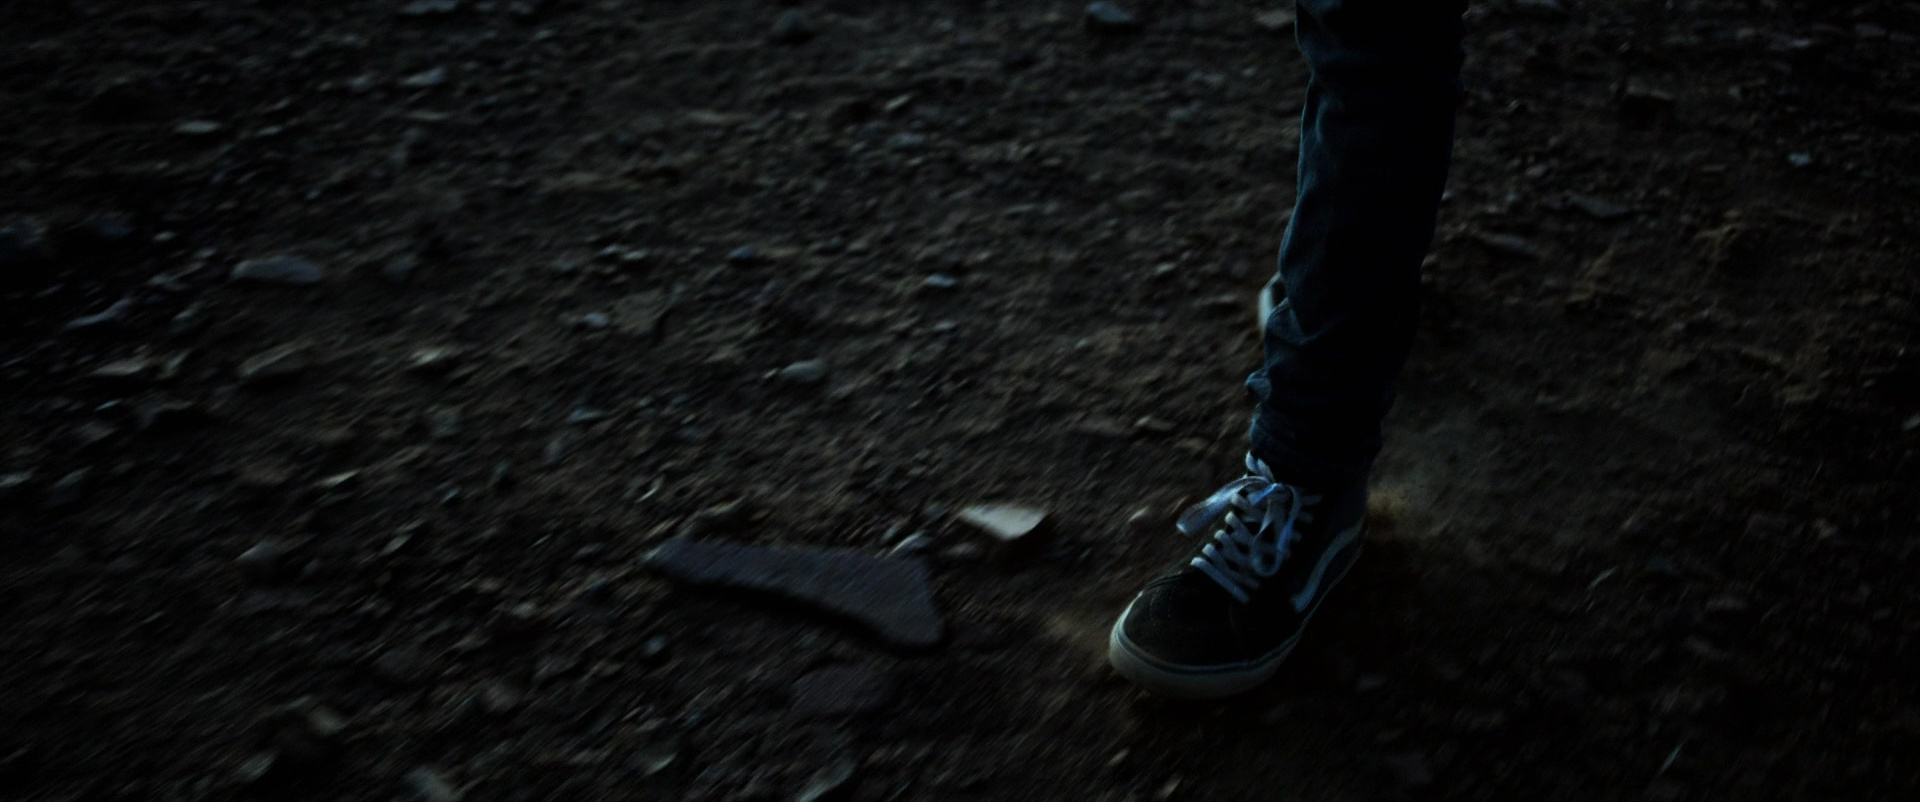 903e30efb0 Vans Sk8-H i(Tm) Core Classics Men s Sneakers Worn by Tom Taylor in ...